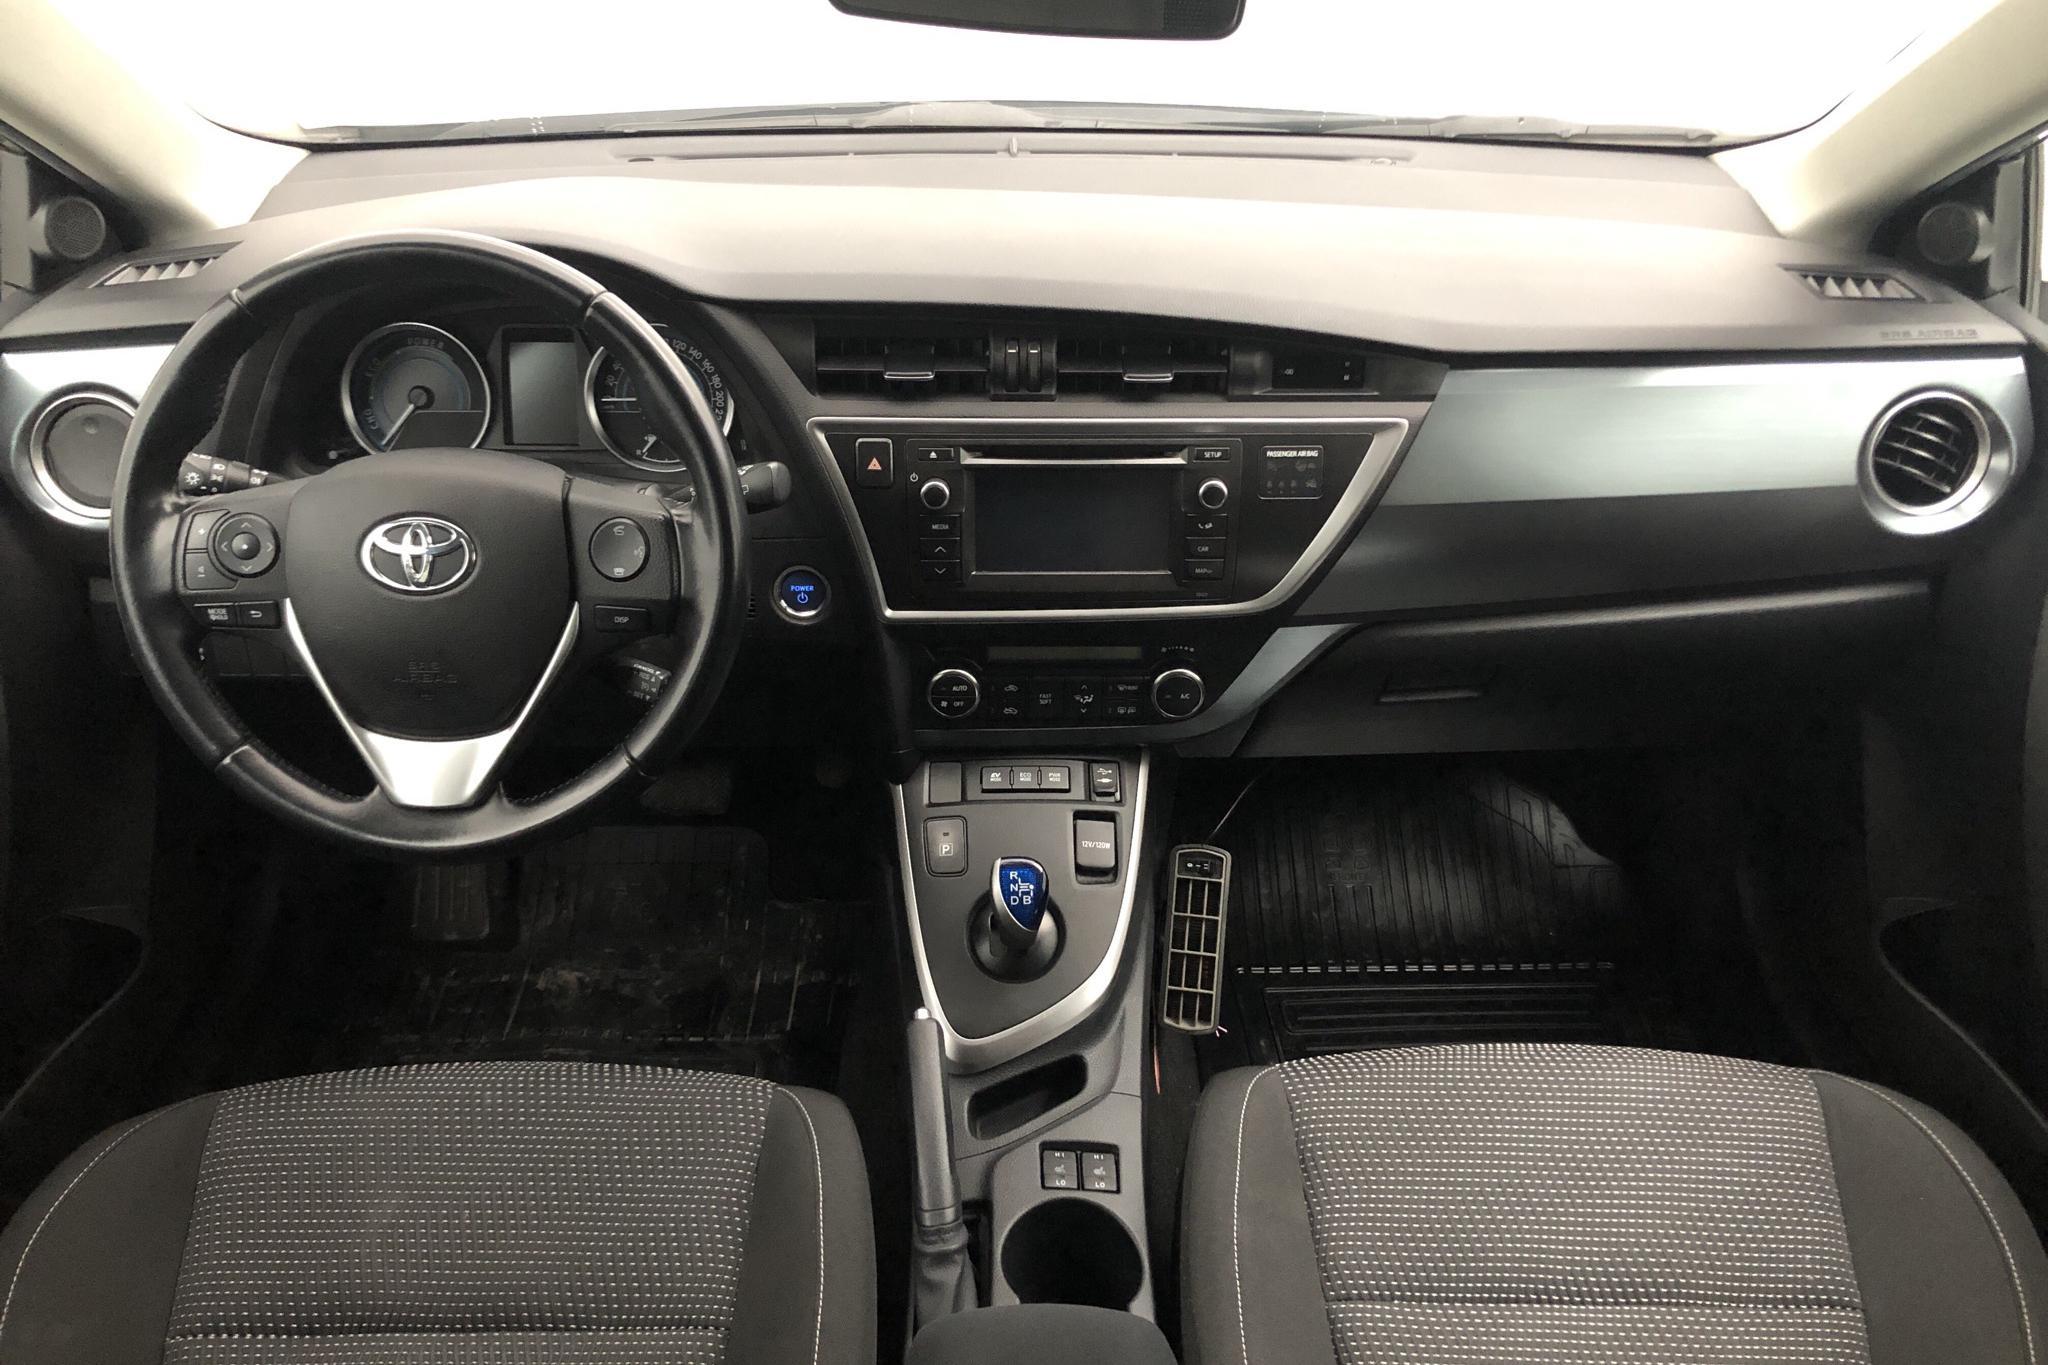 Toyota Auris 1.8 HSD Touring Sports (99hk) - 99 850 km - Automatic - Light Grey - 2014